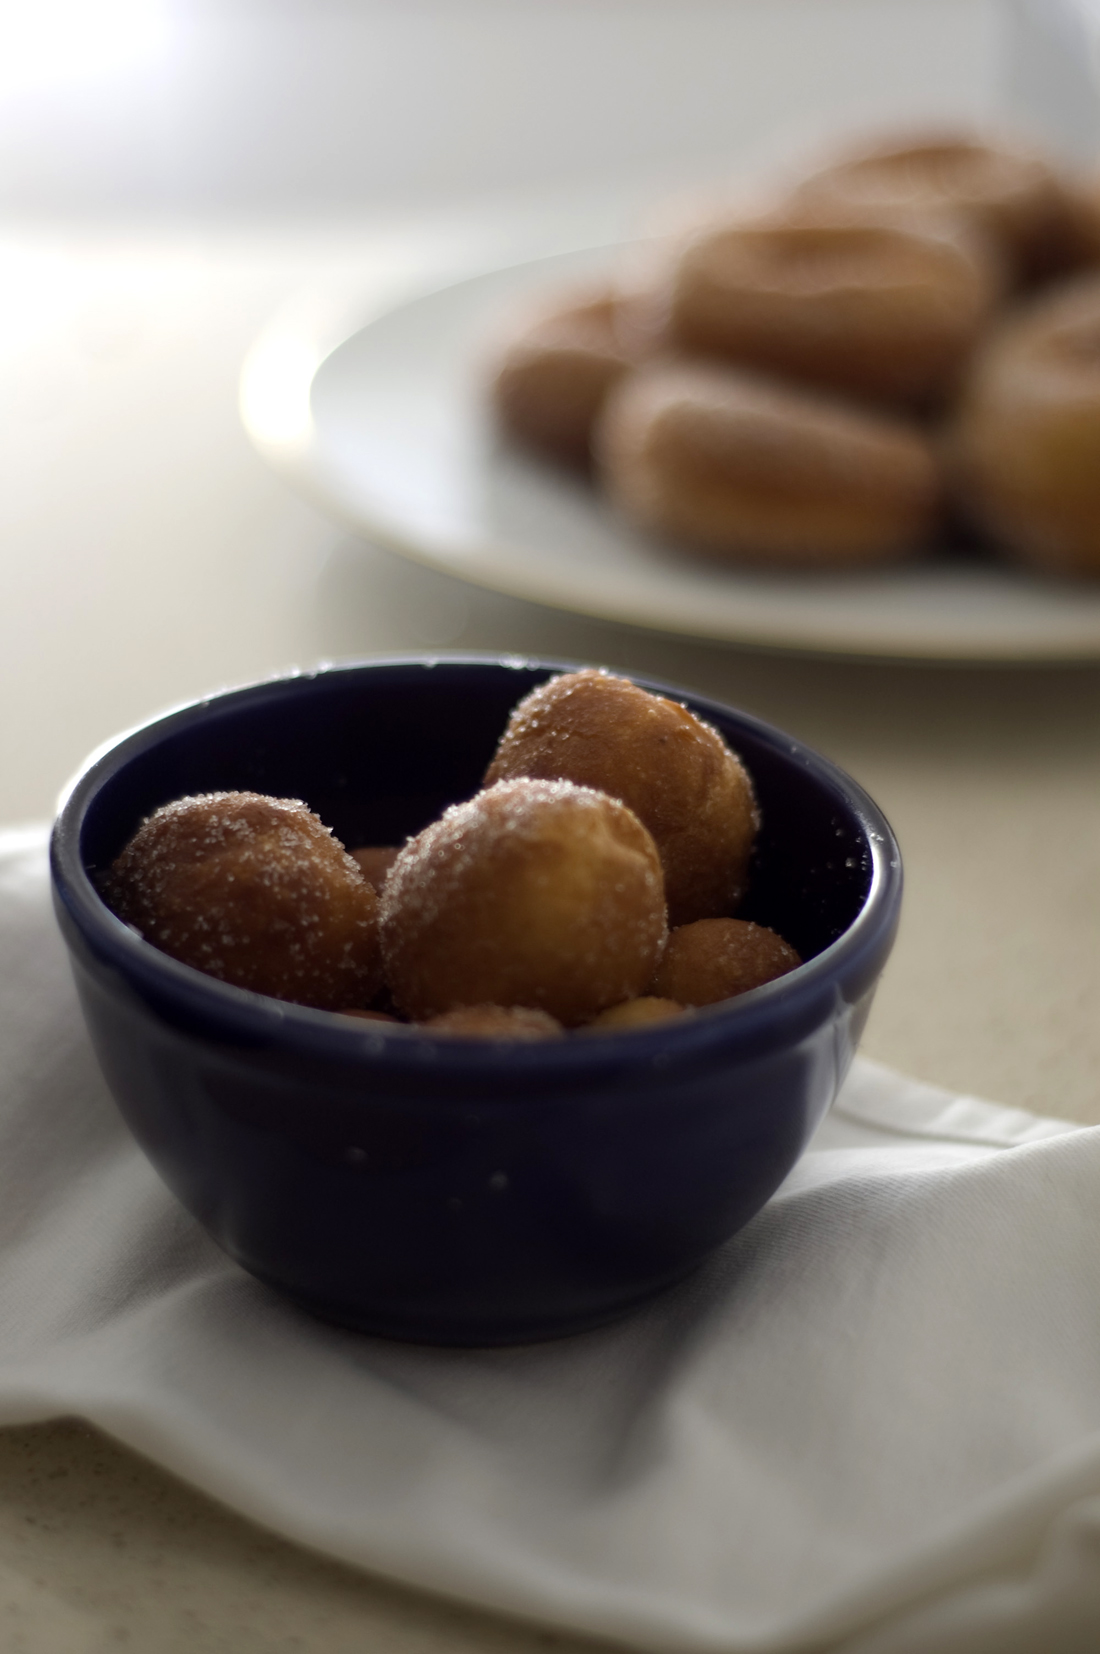 Donuts // Doughnuts